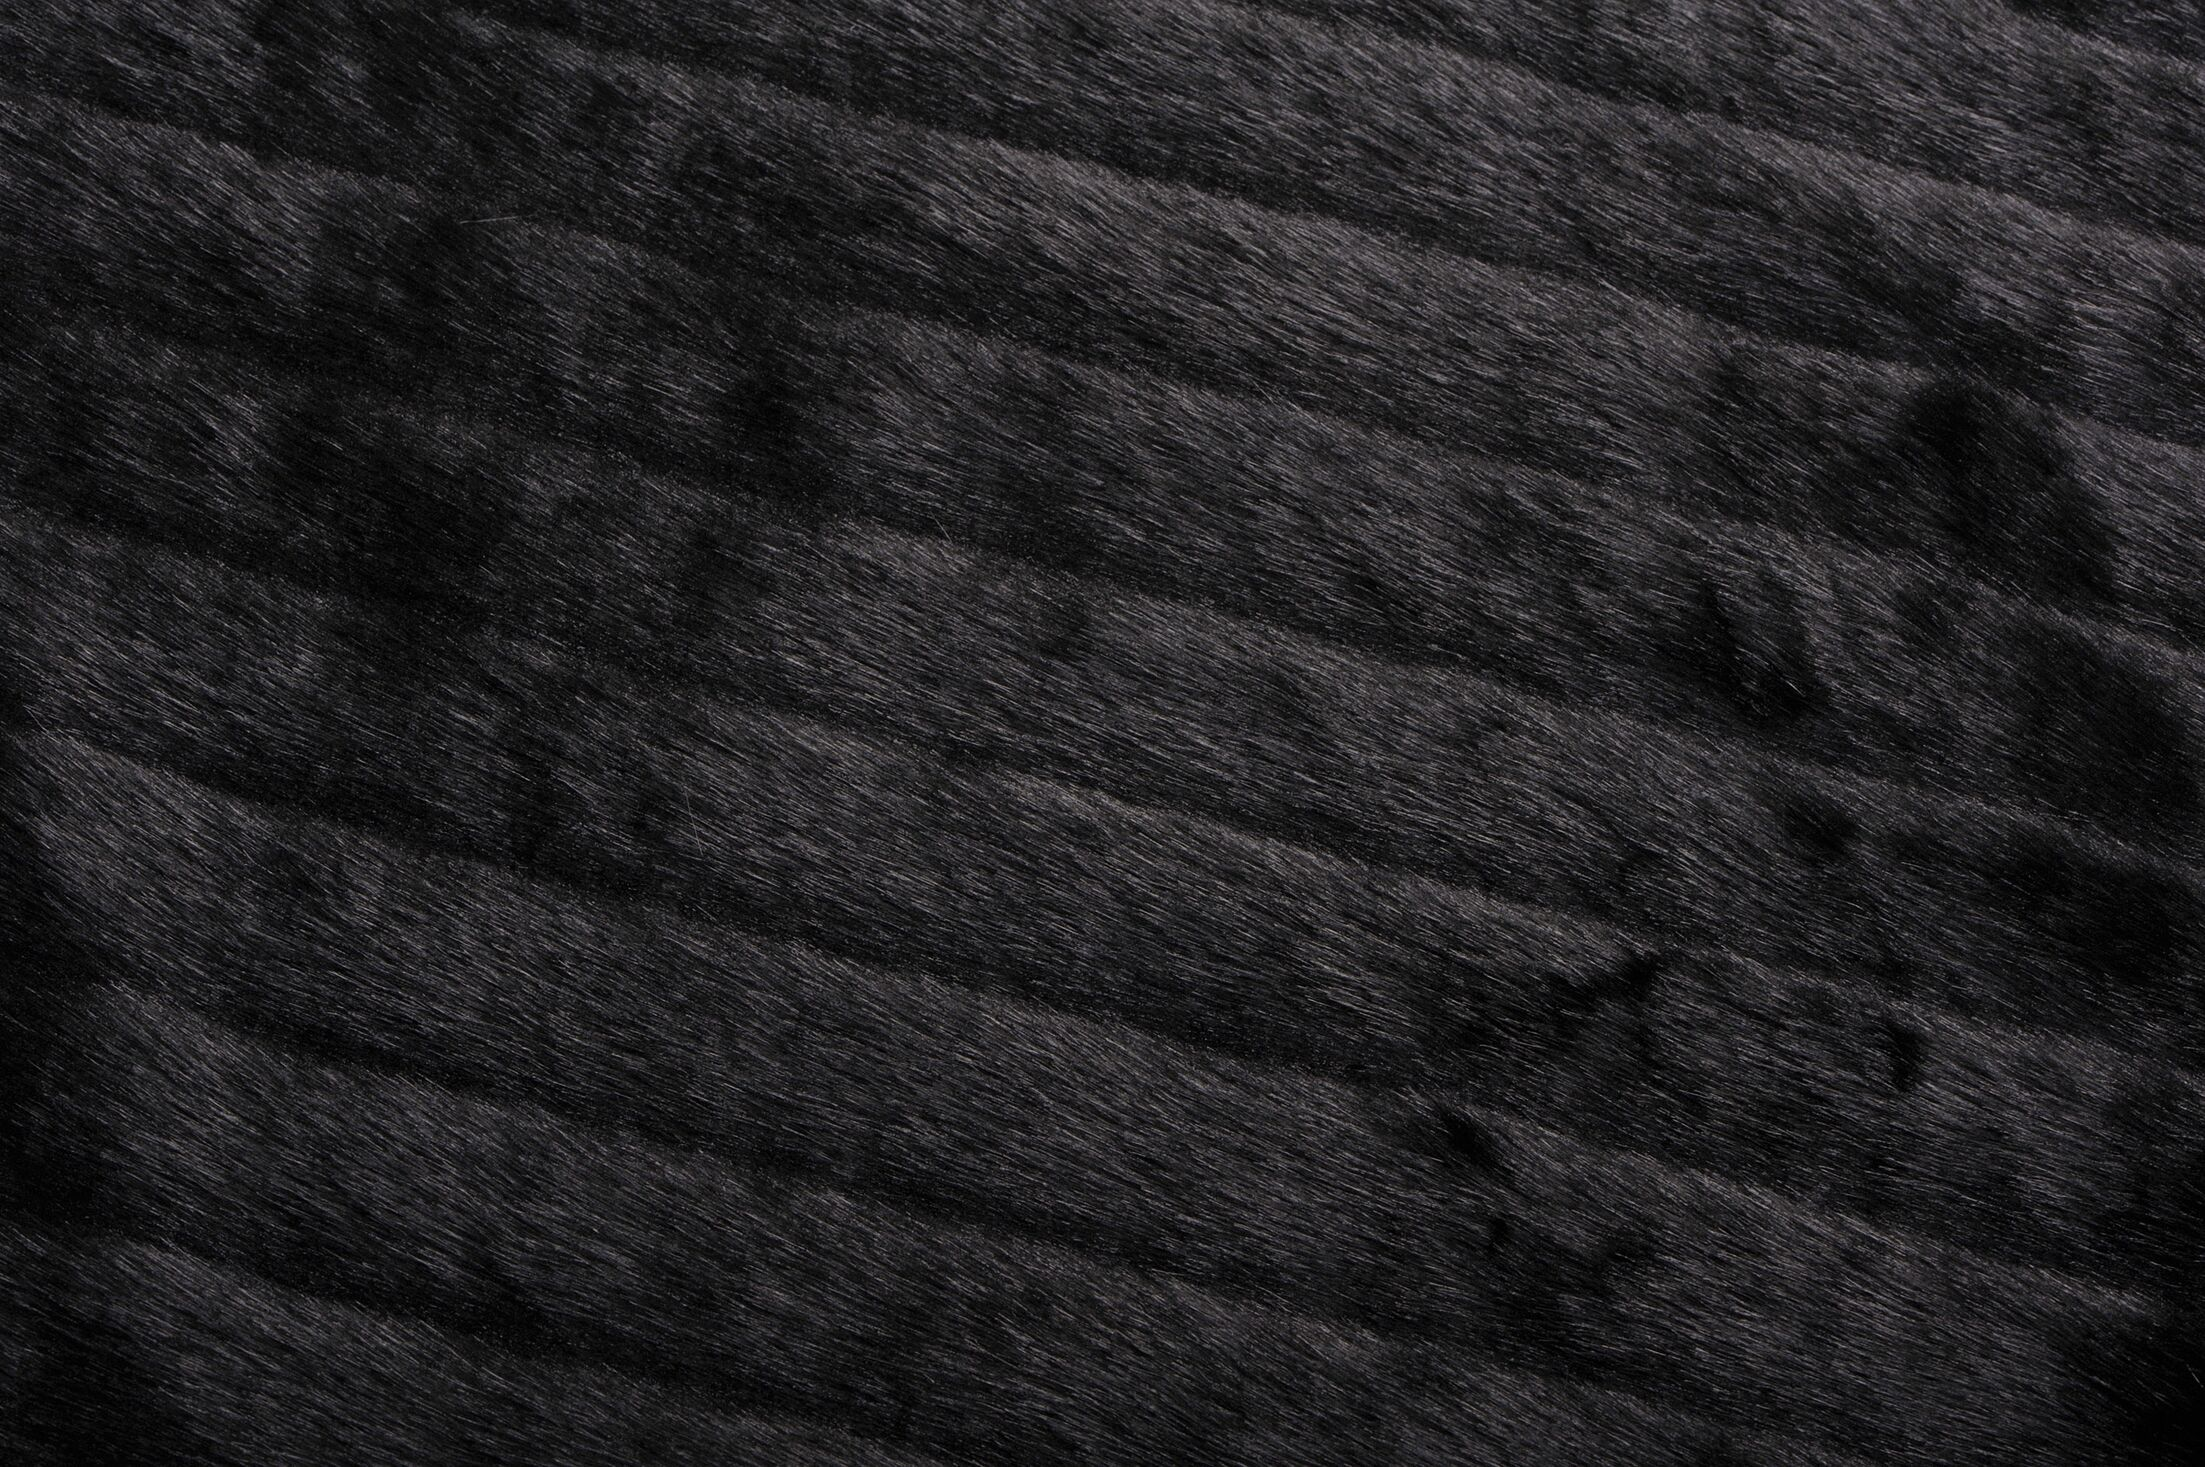 Cyra Black Area Rug Rug Size: Rectangle 5' x 7'